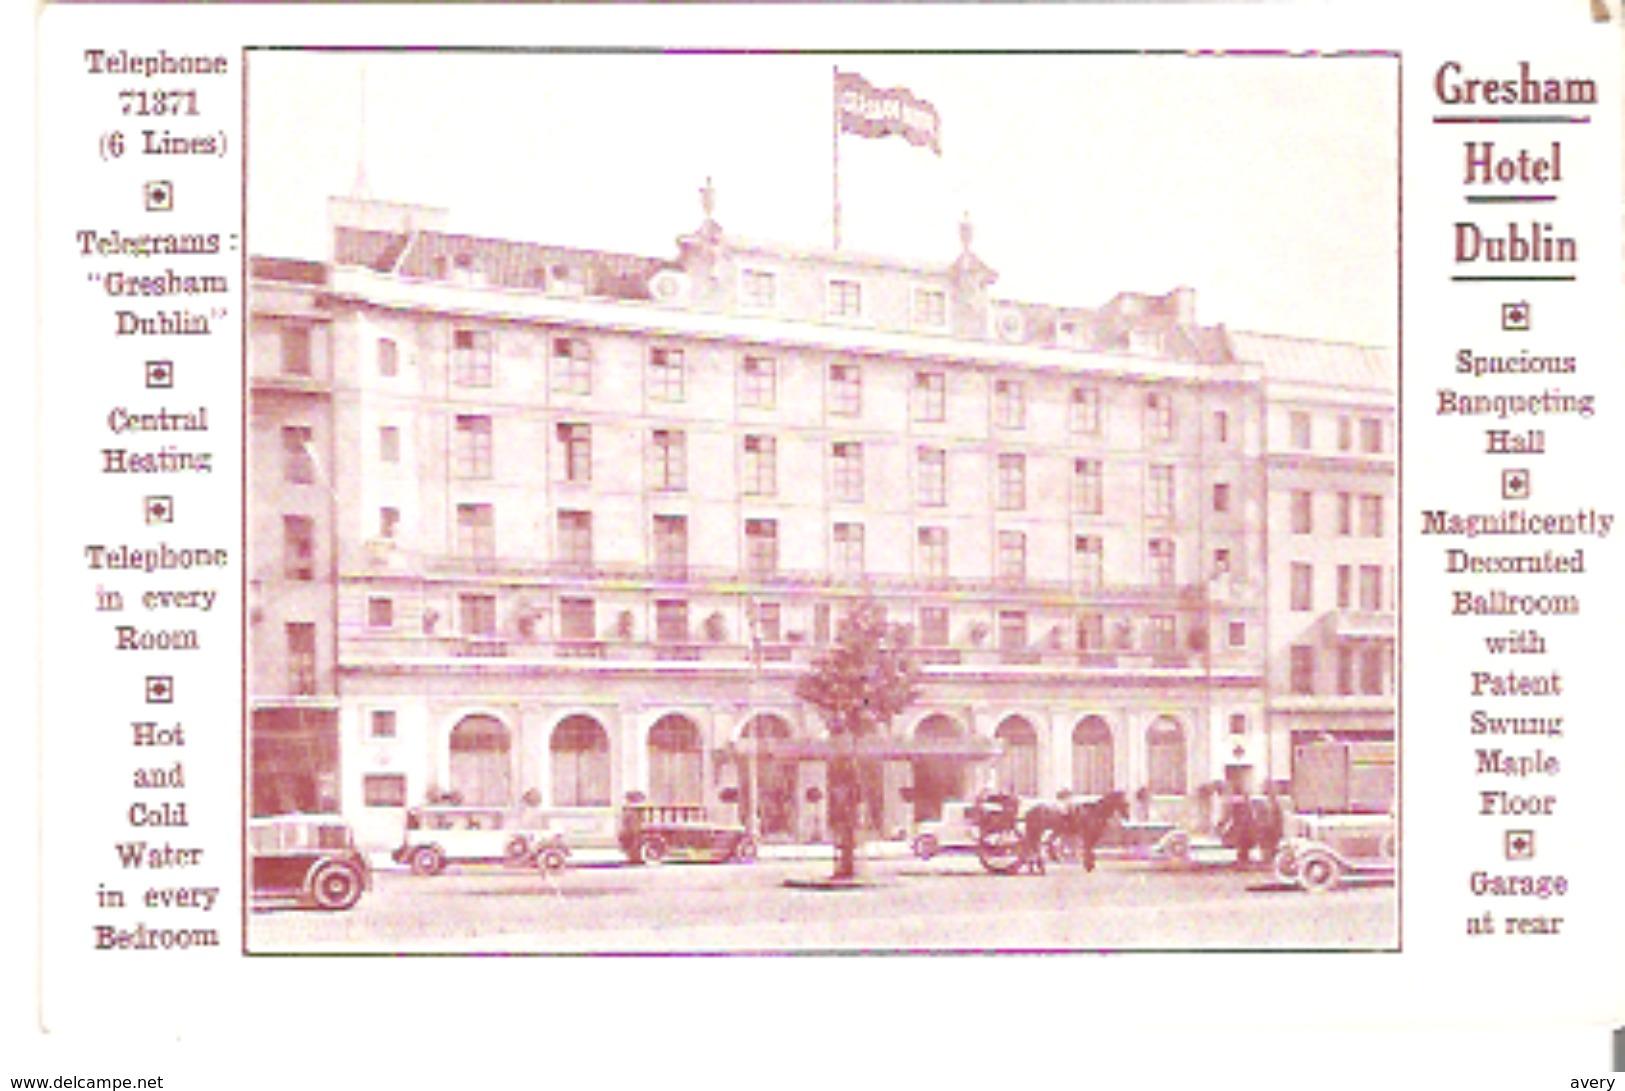 Gresham Hotel, Dublin, Ireland - Dublin